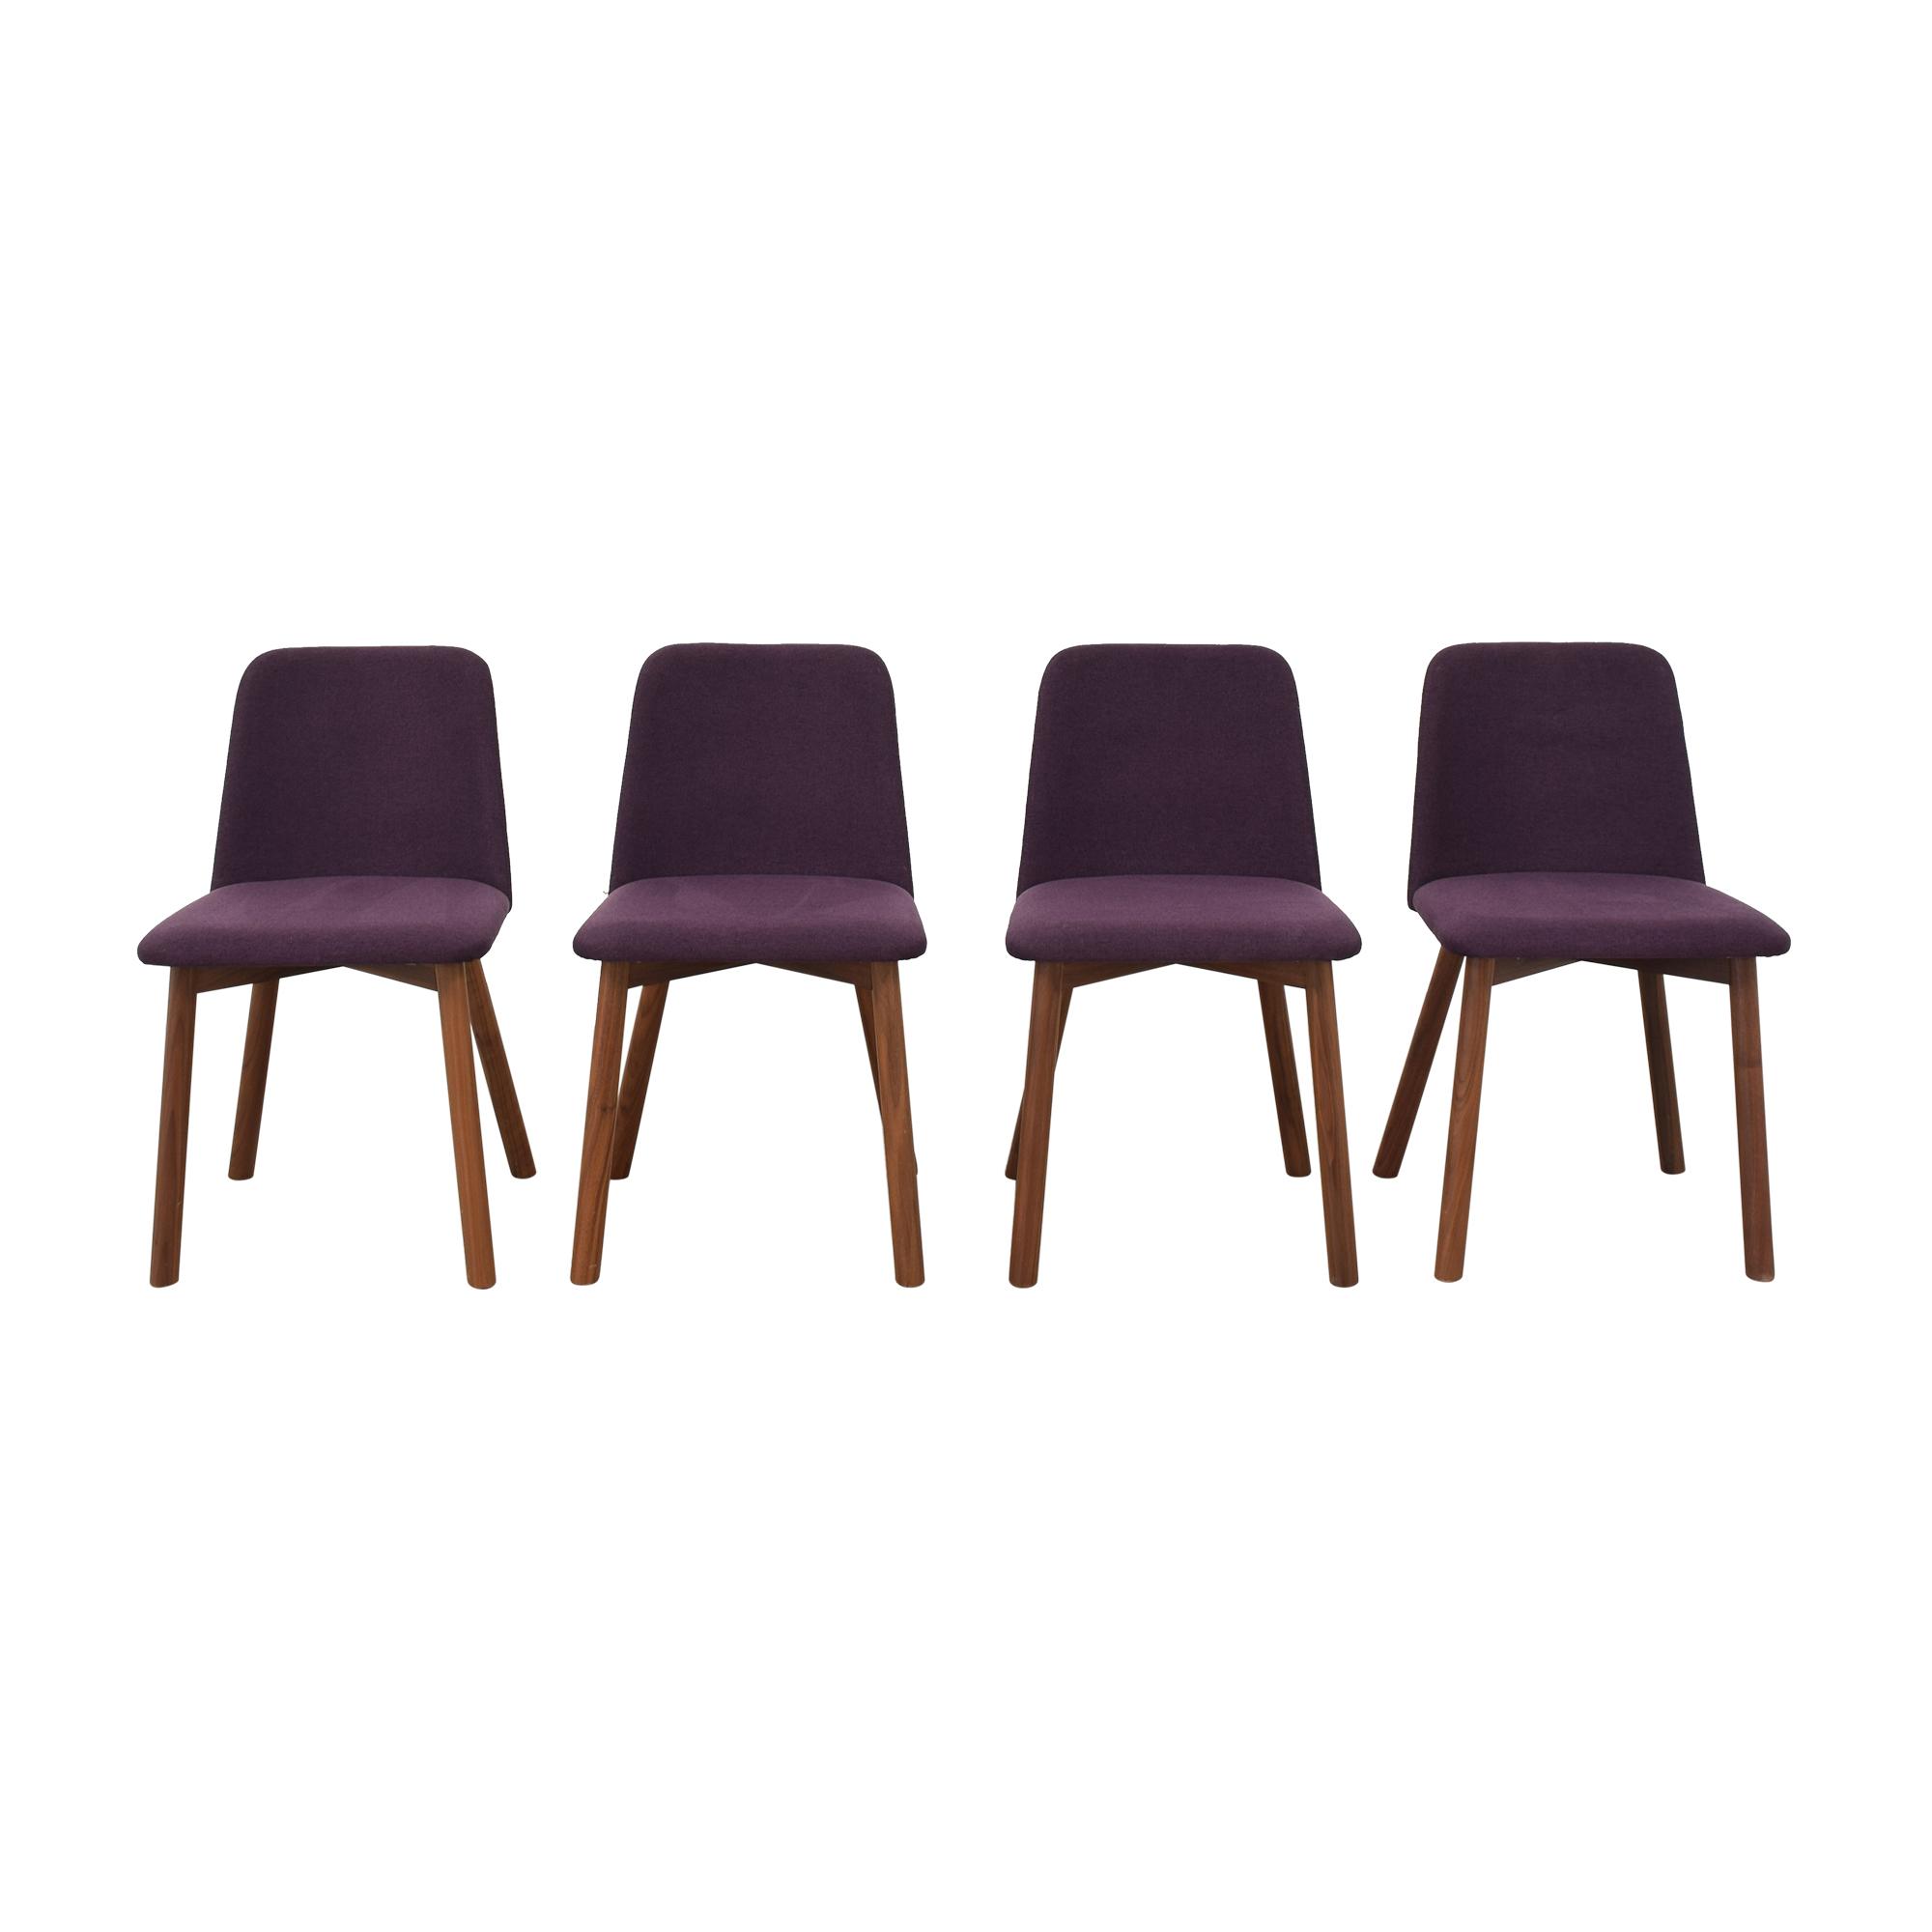 Blu Dot Blu Dot Chip Chairs price